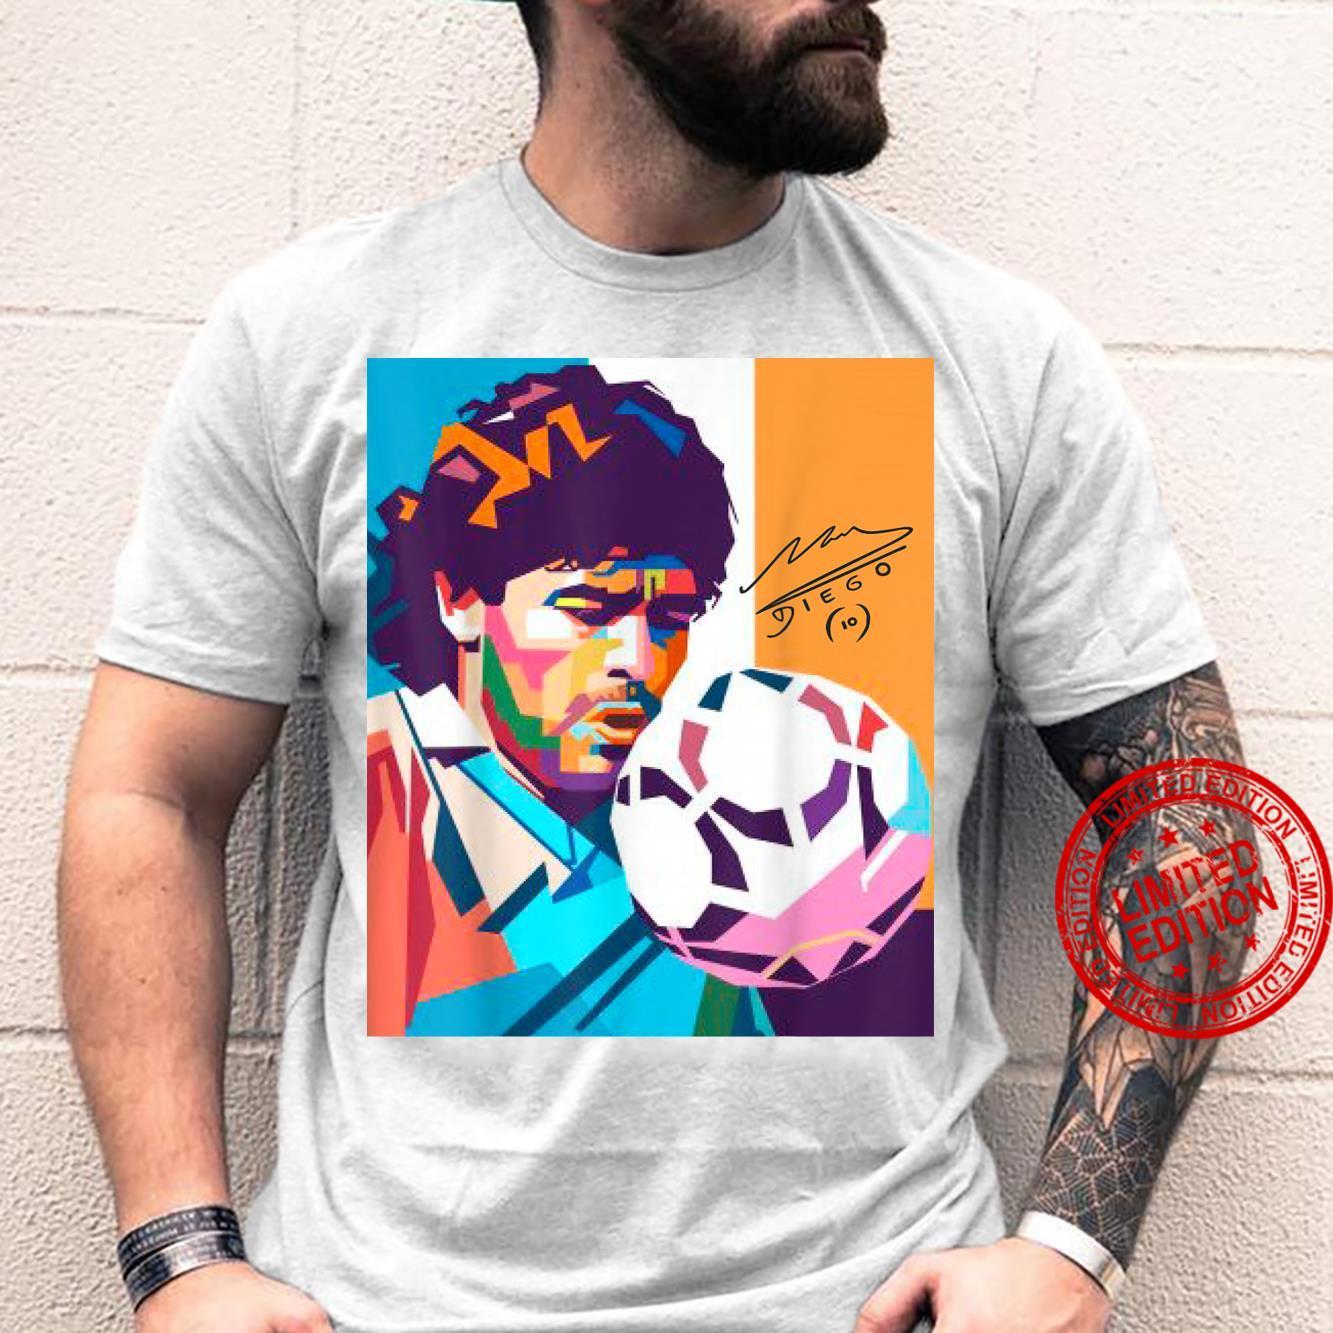 MARADONA, THE BEST PLAYER OF THE CENTURY Shirt